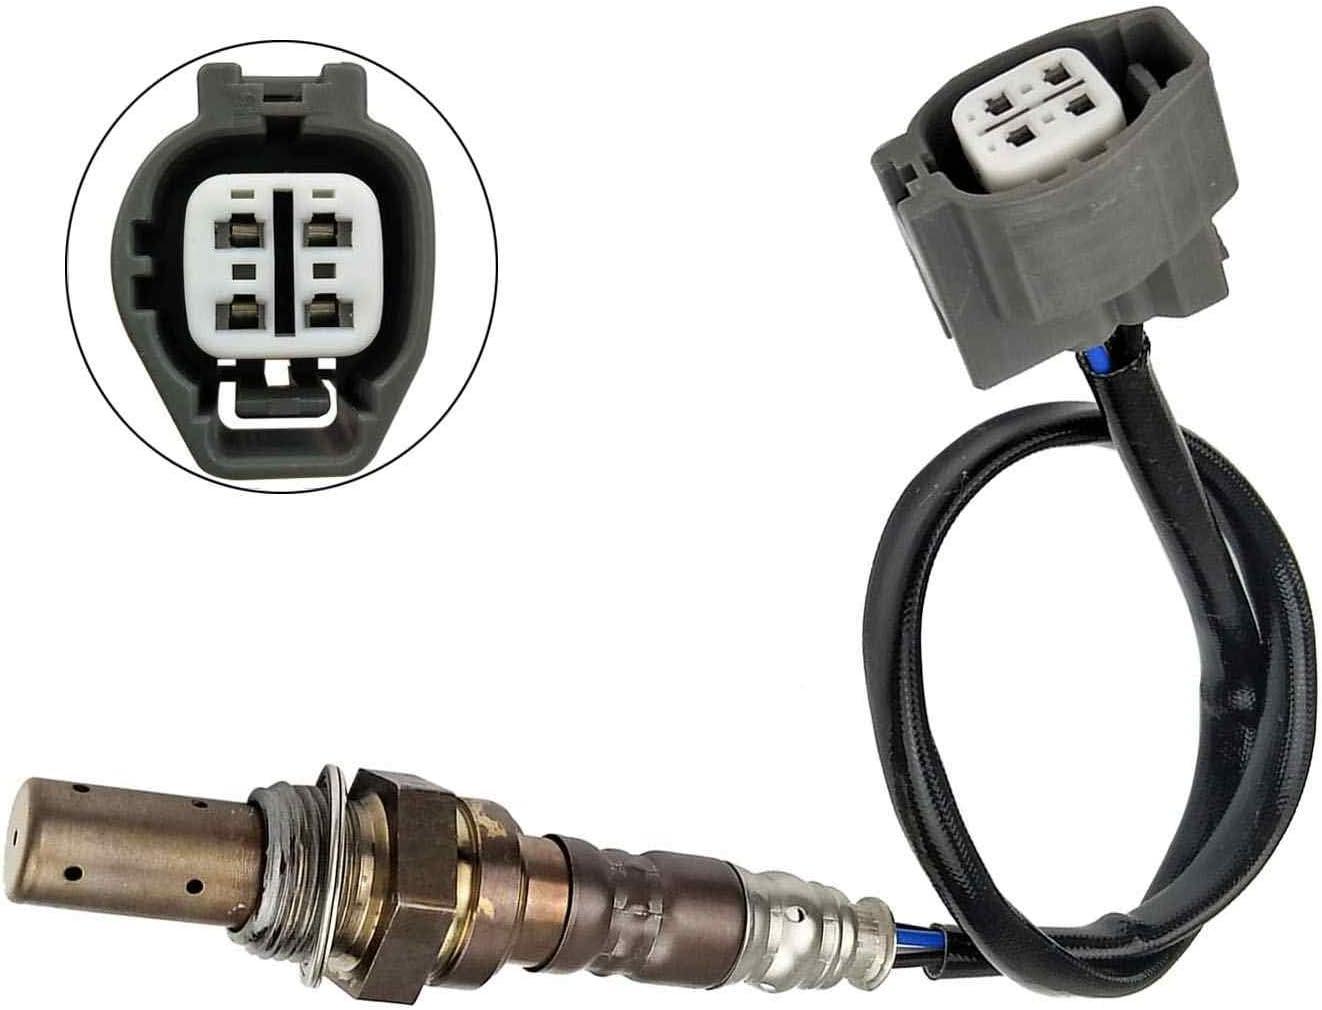 Air Fuel Ratio Oxygen Sensor 234-9016 For Jaguar Vanden Plas XJ8 XJR XK8 XKR 4.0